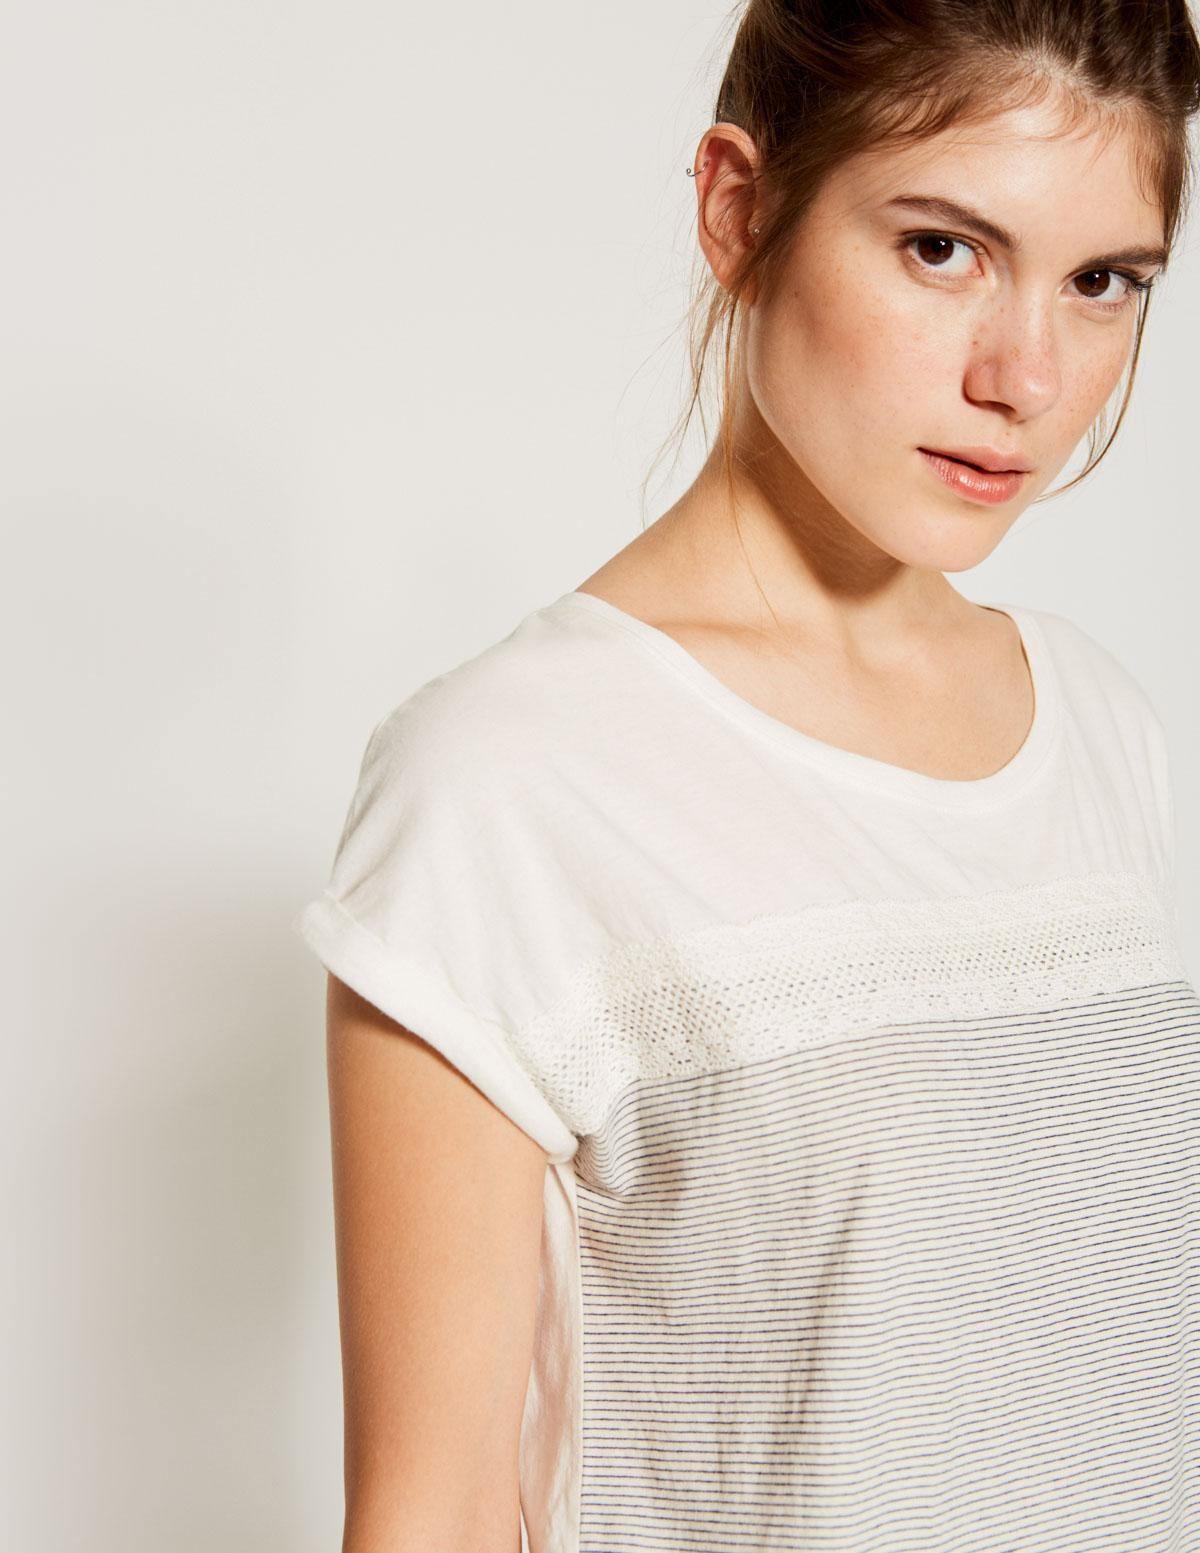 Camiseta rayas y puntilla - Ítem1